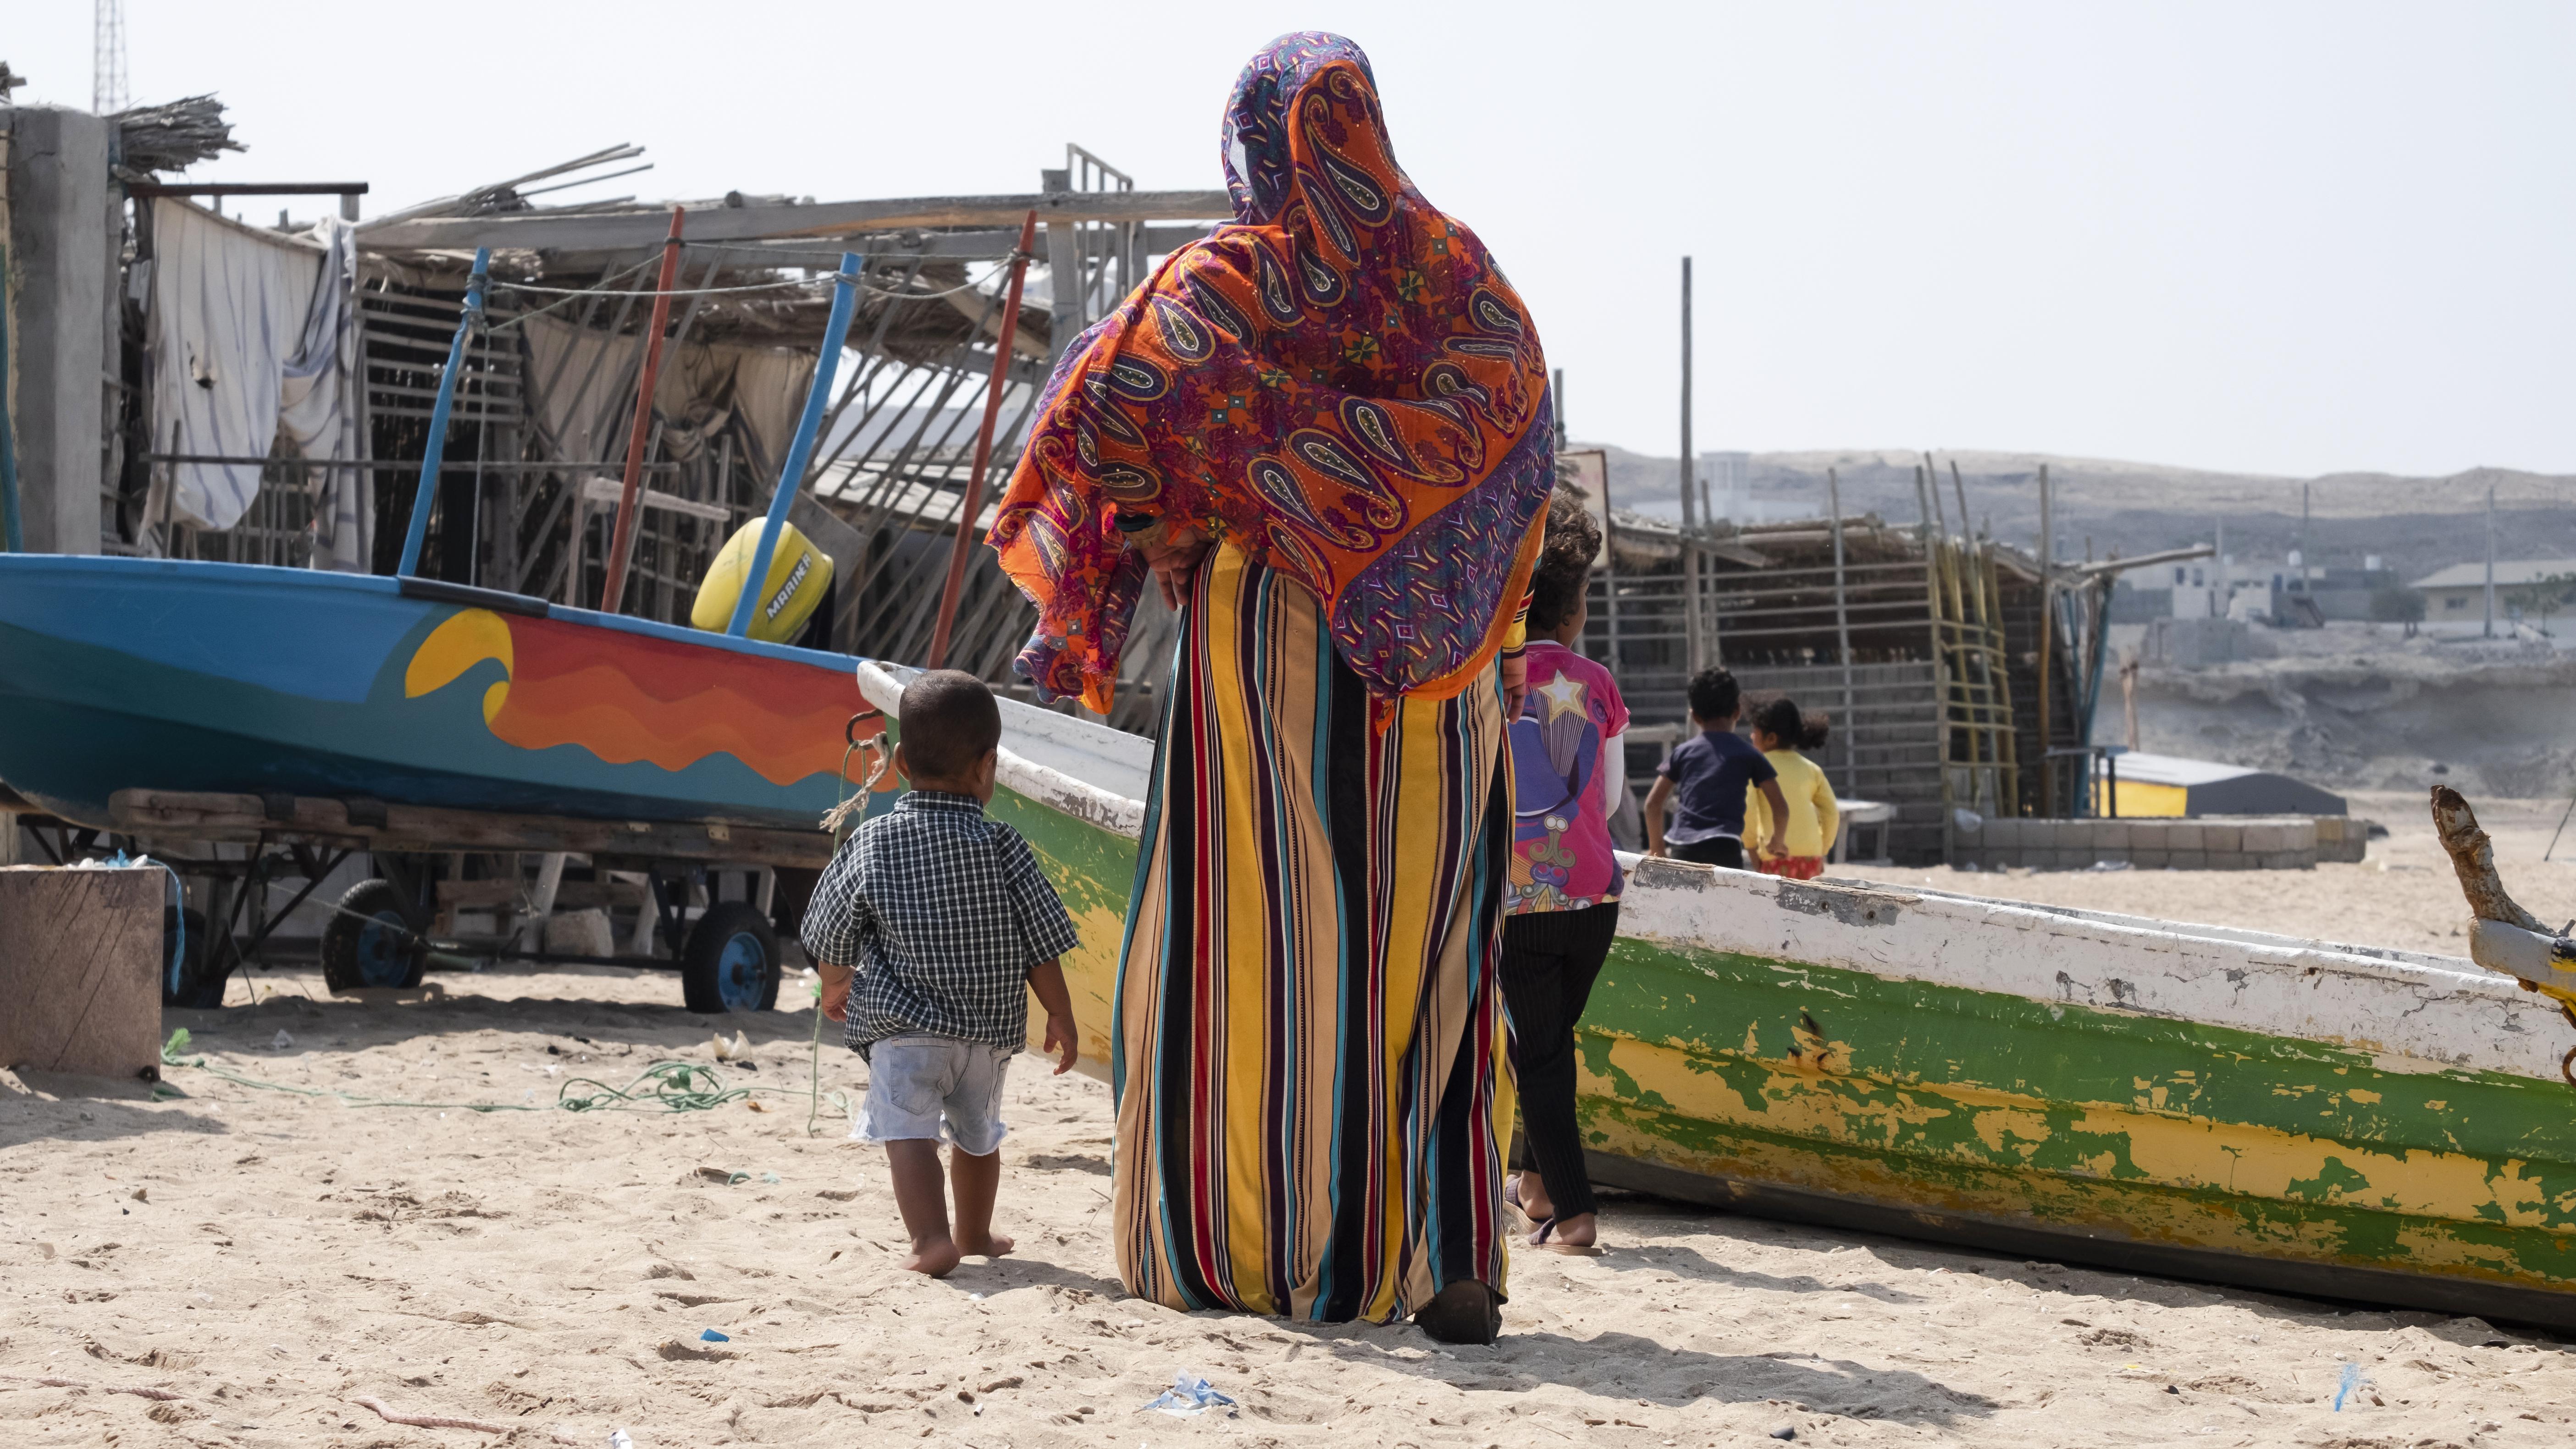 Nelayan perempuan berdiri di dekat kapal bersama anak laki-laki.